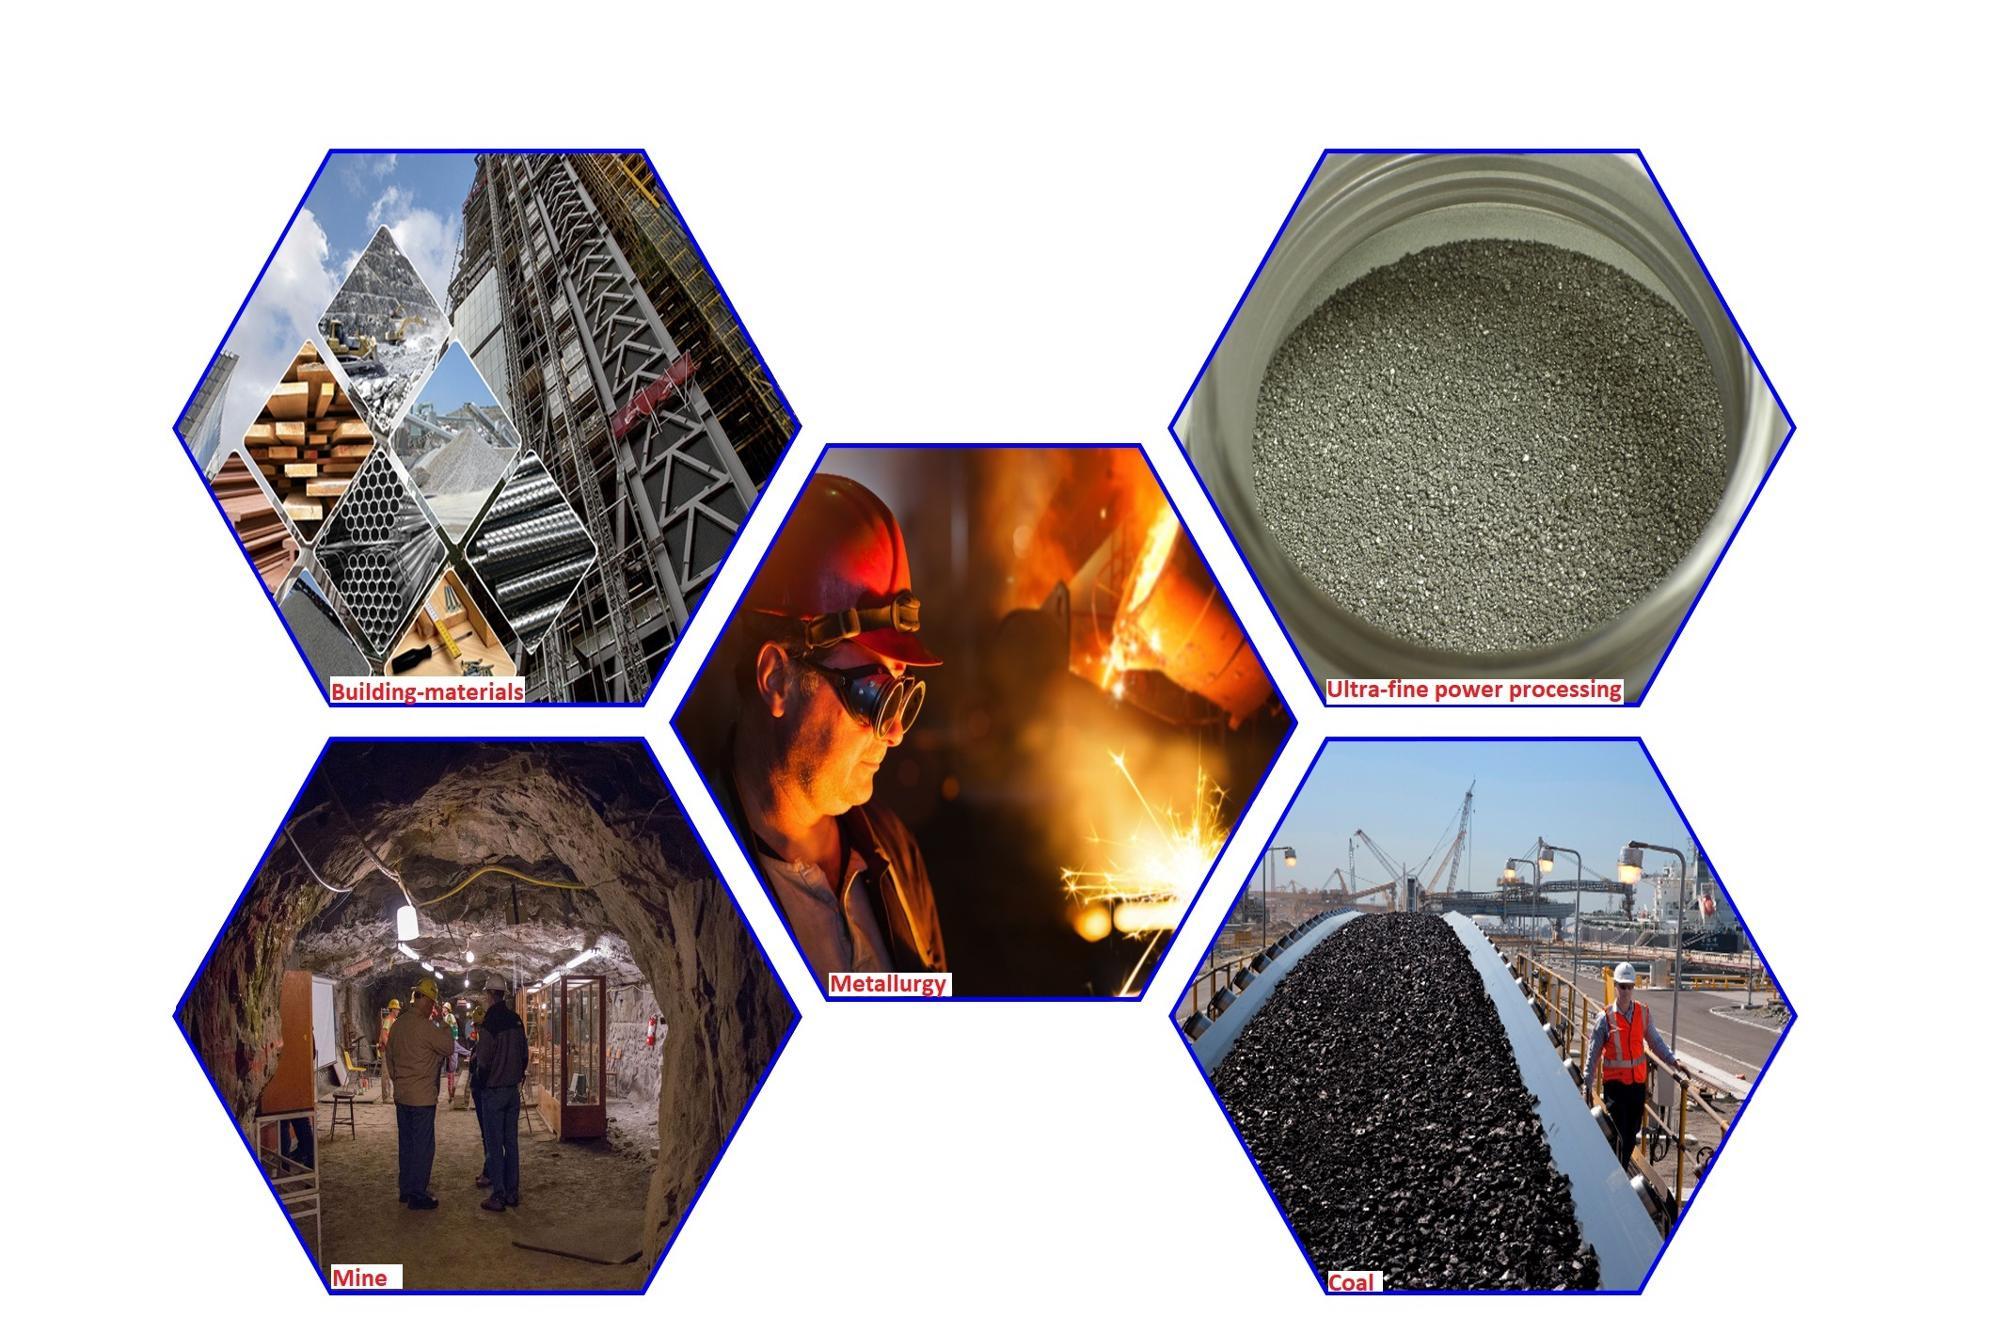 En Kaliteli karbon aktif filtreler Toz Filtrasyonu için.